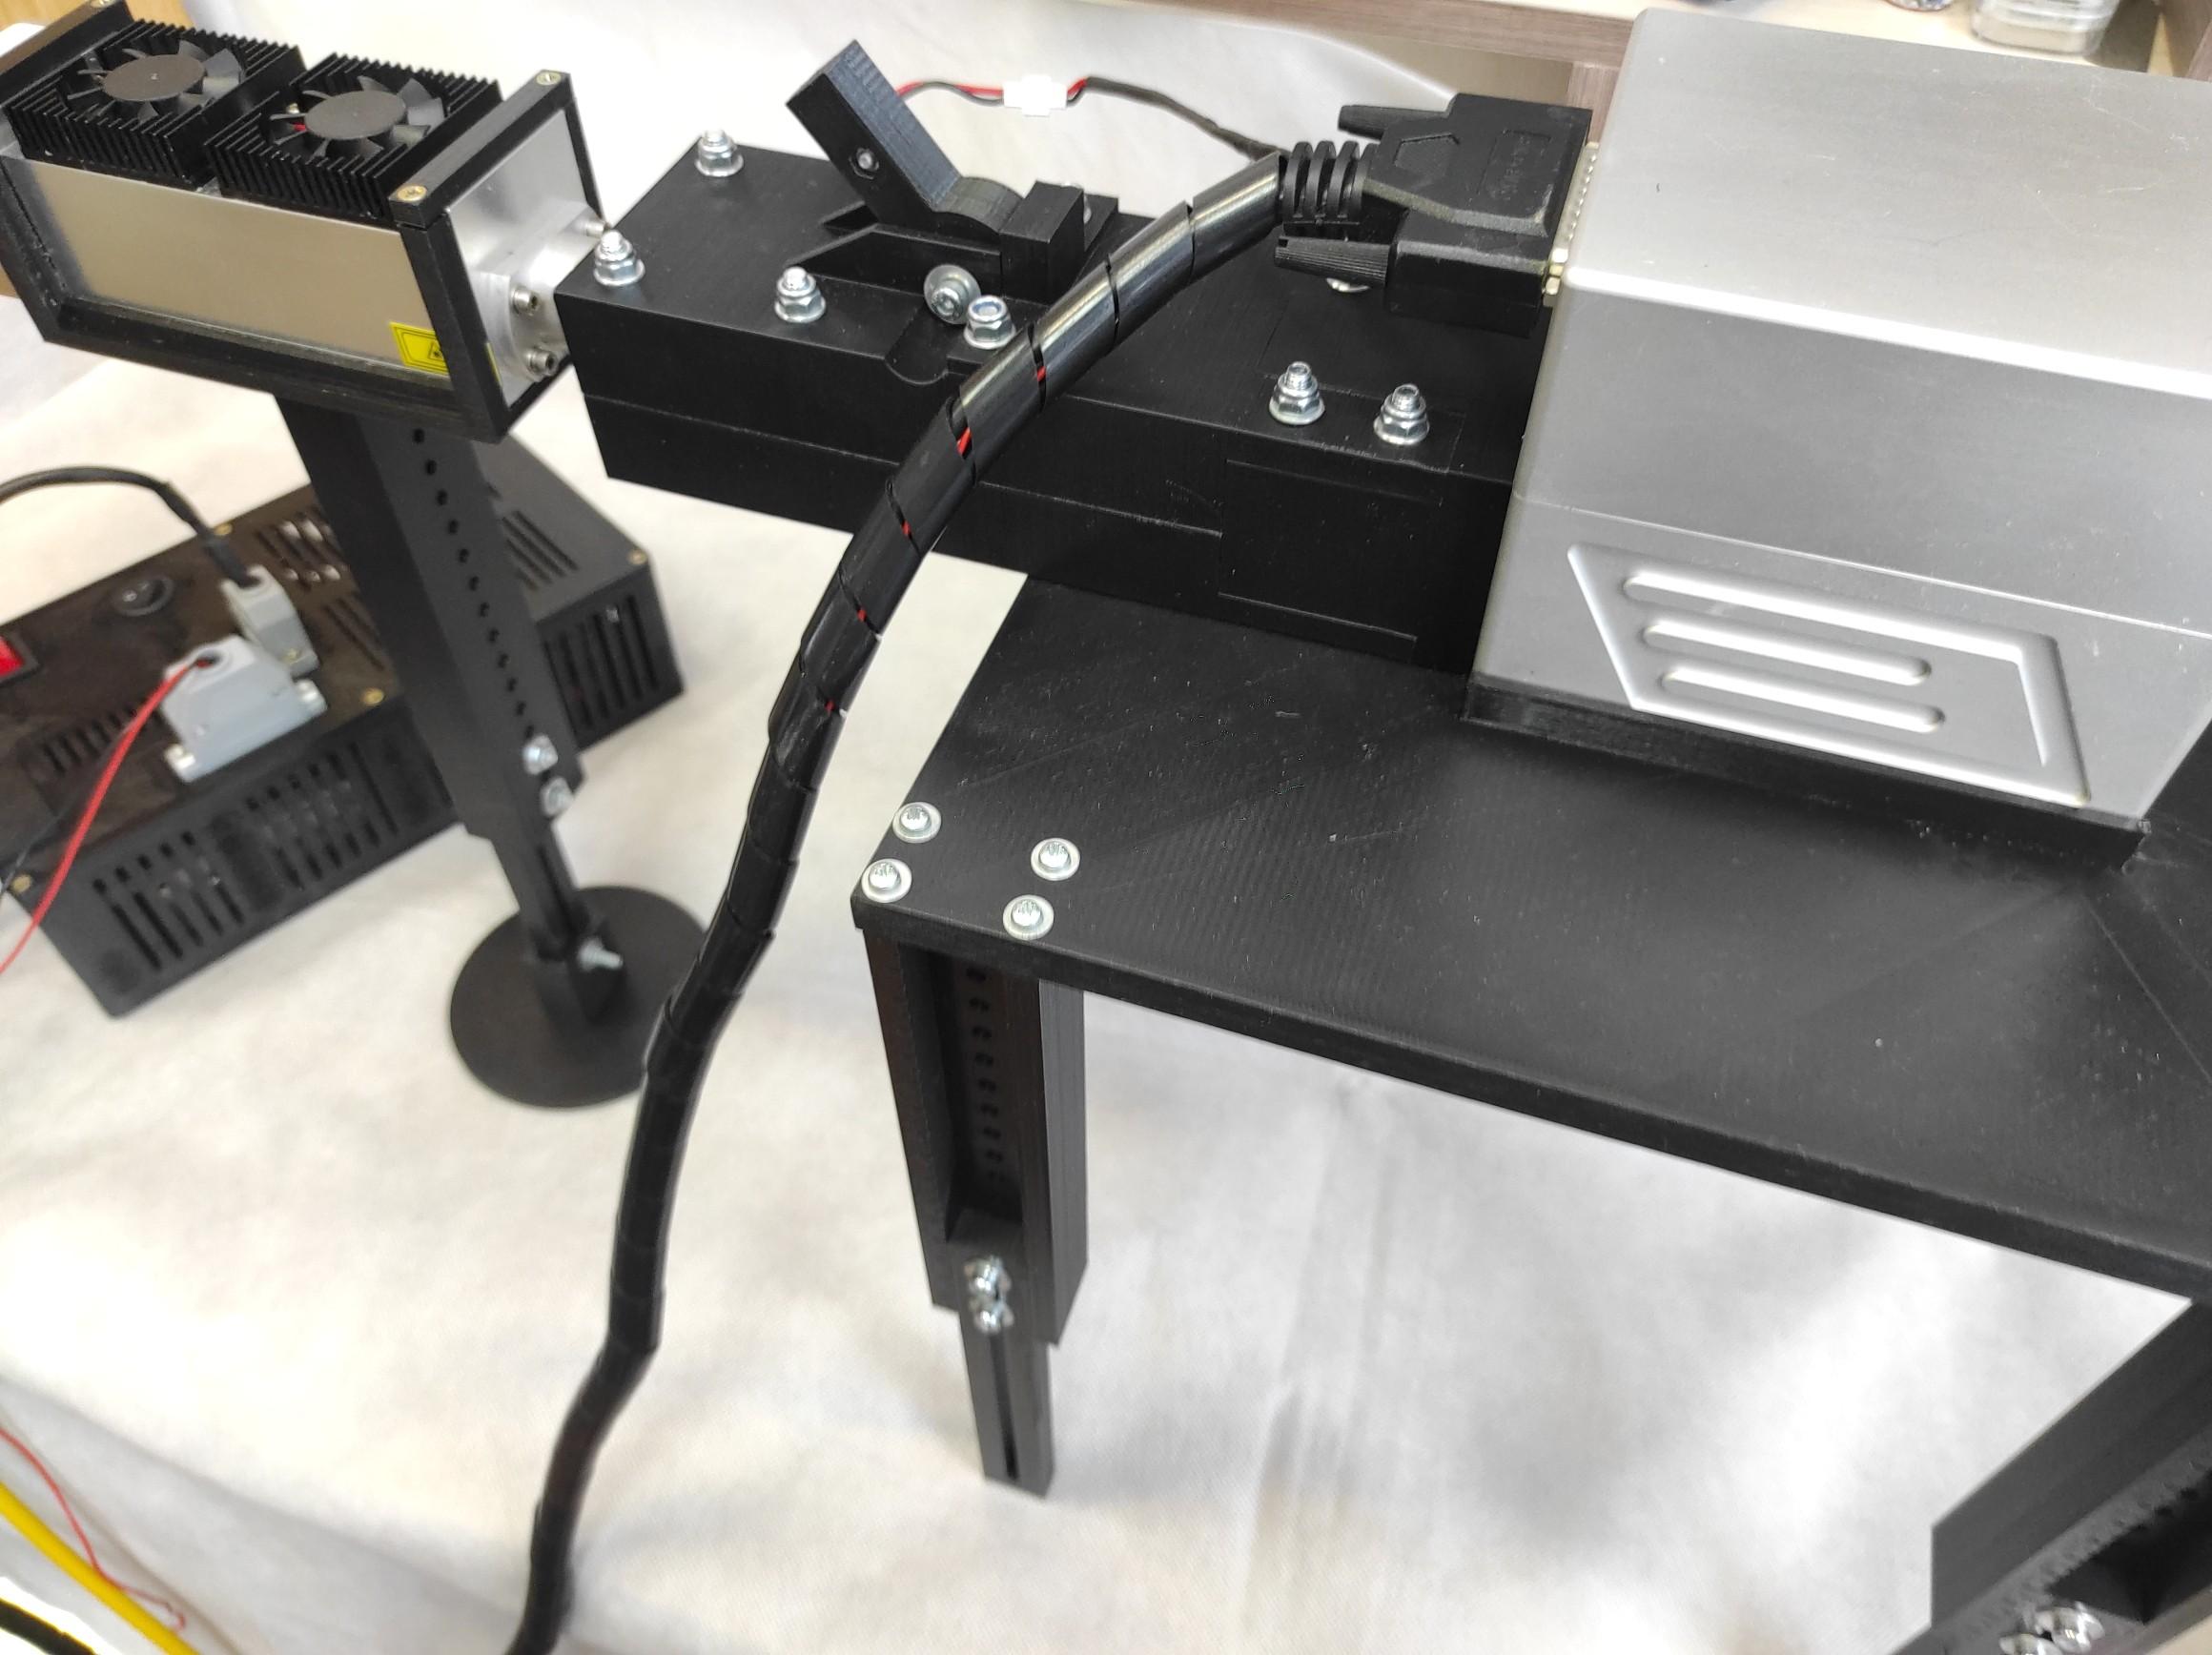 An Endurance DIY galvo marking machine